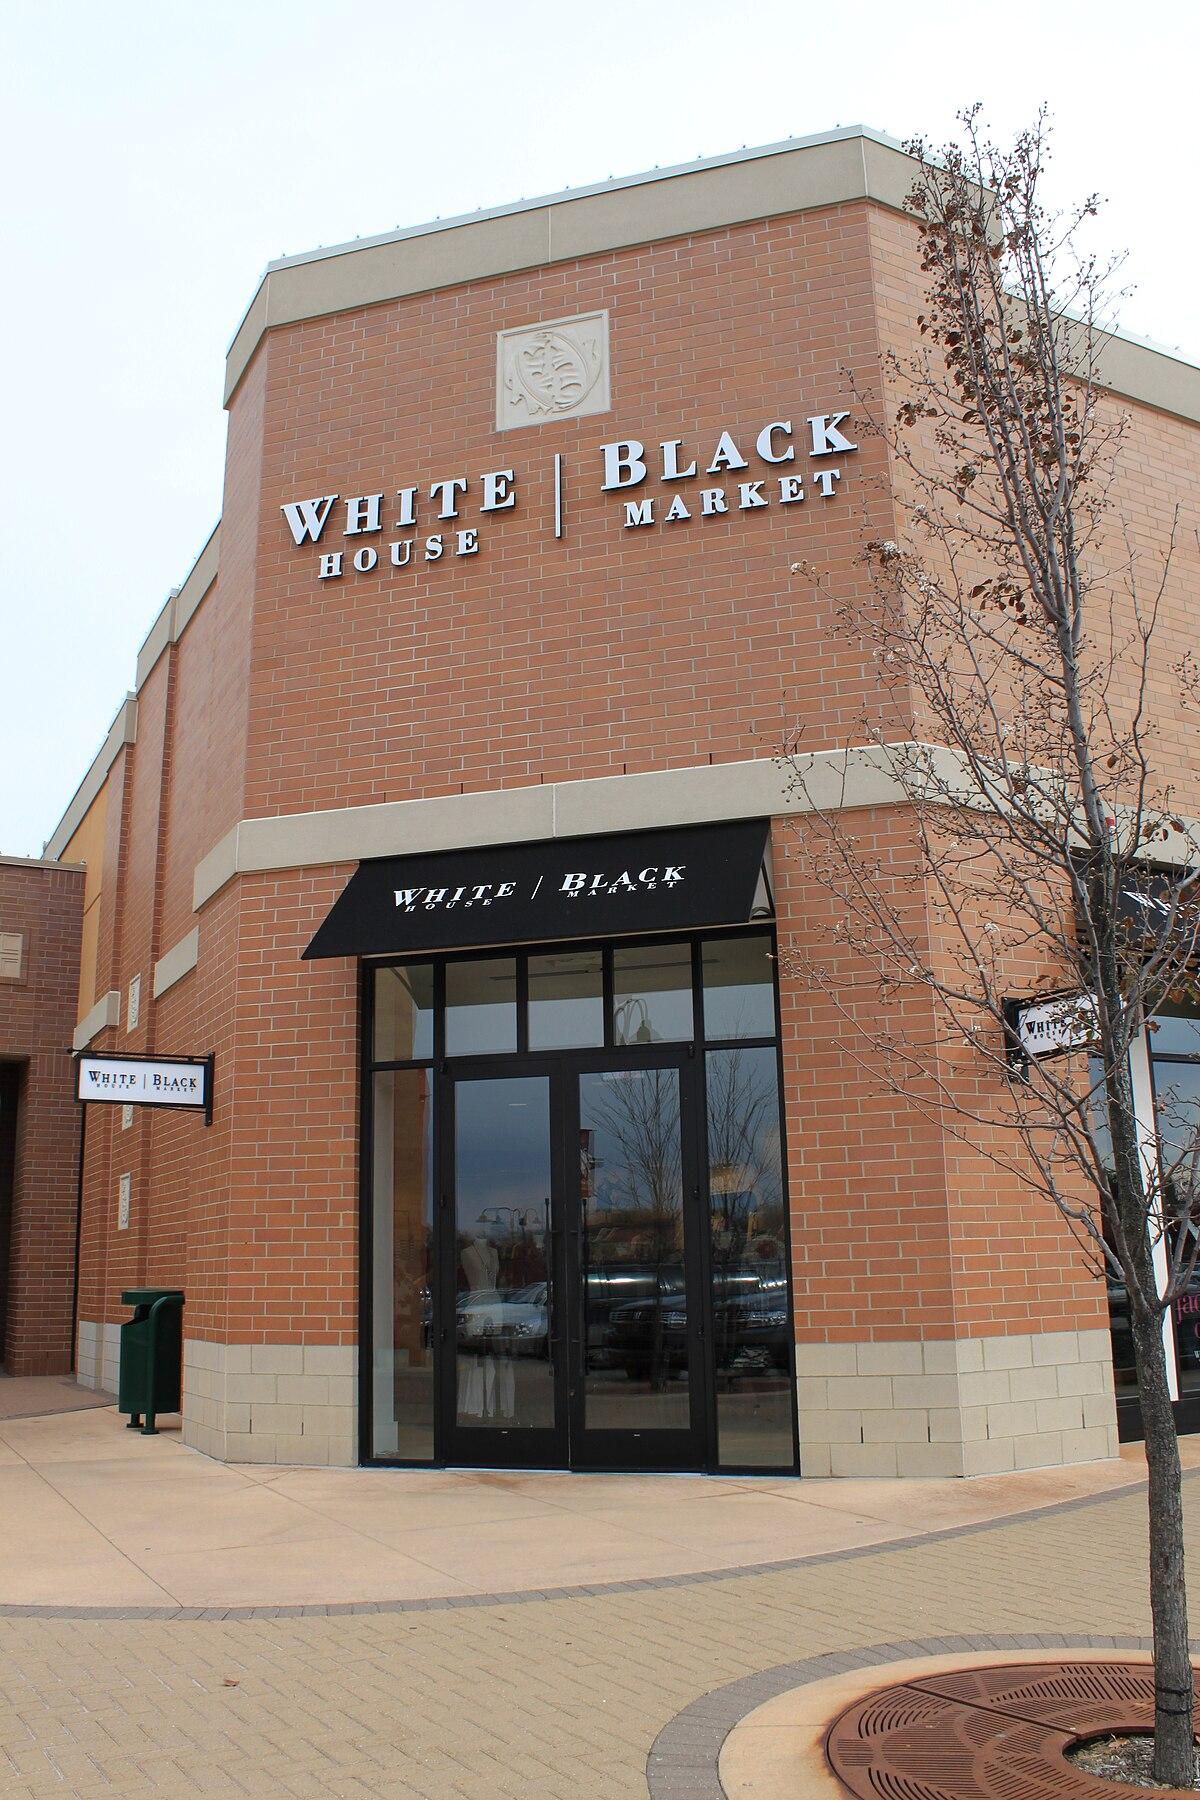 White House Black Market - Wikidata